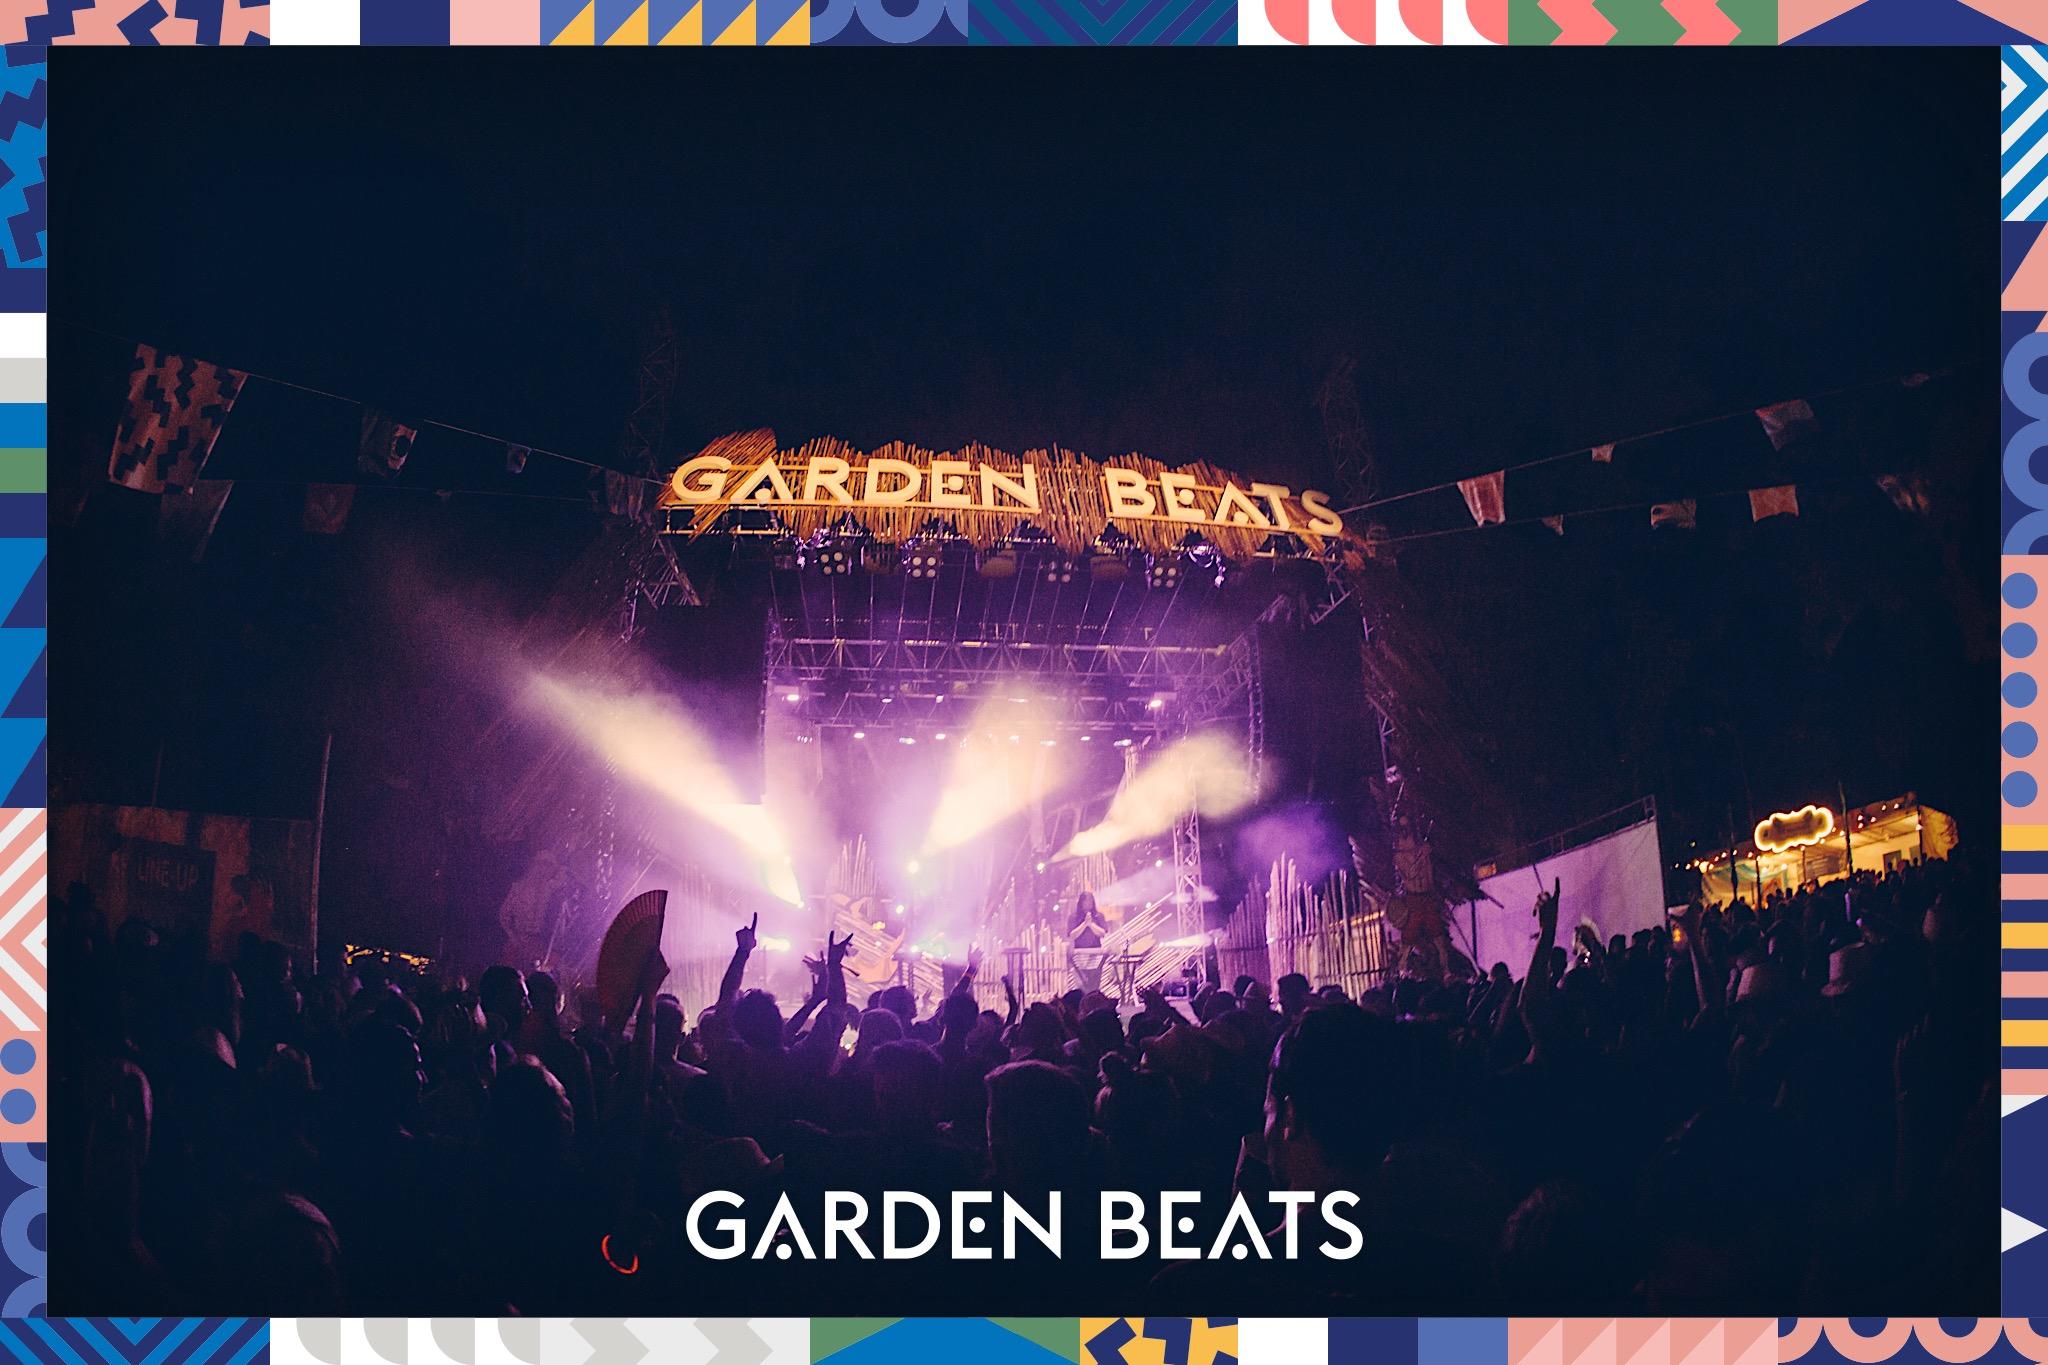 18032017_GardenBeats_Colossal780_WatermarkedGB.jpg